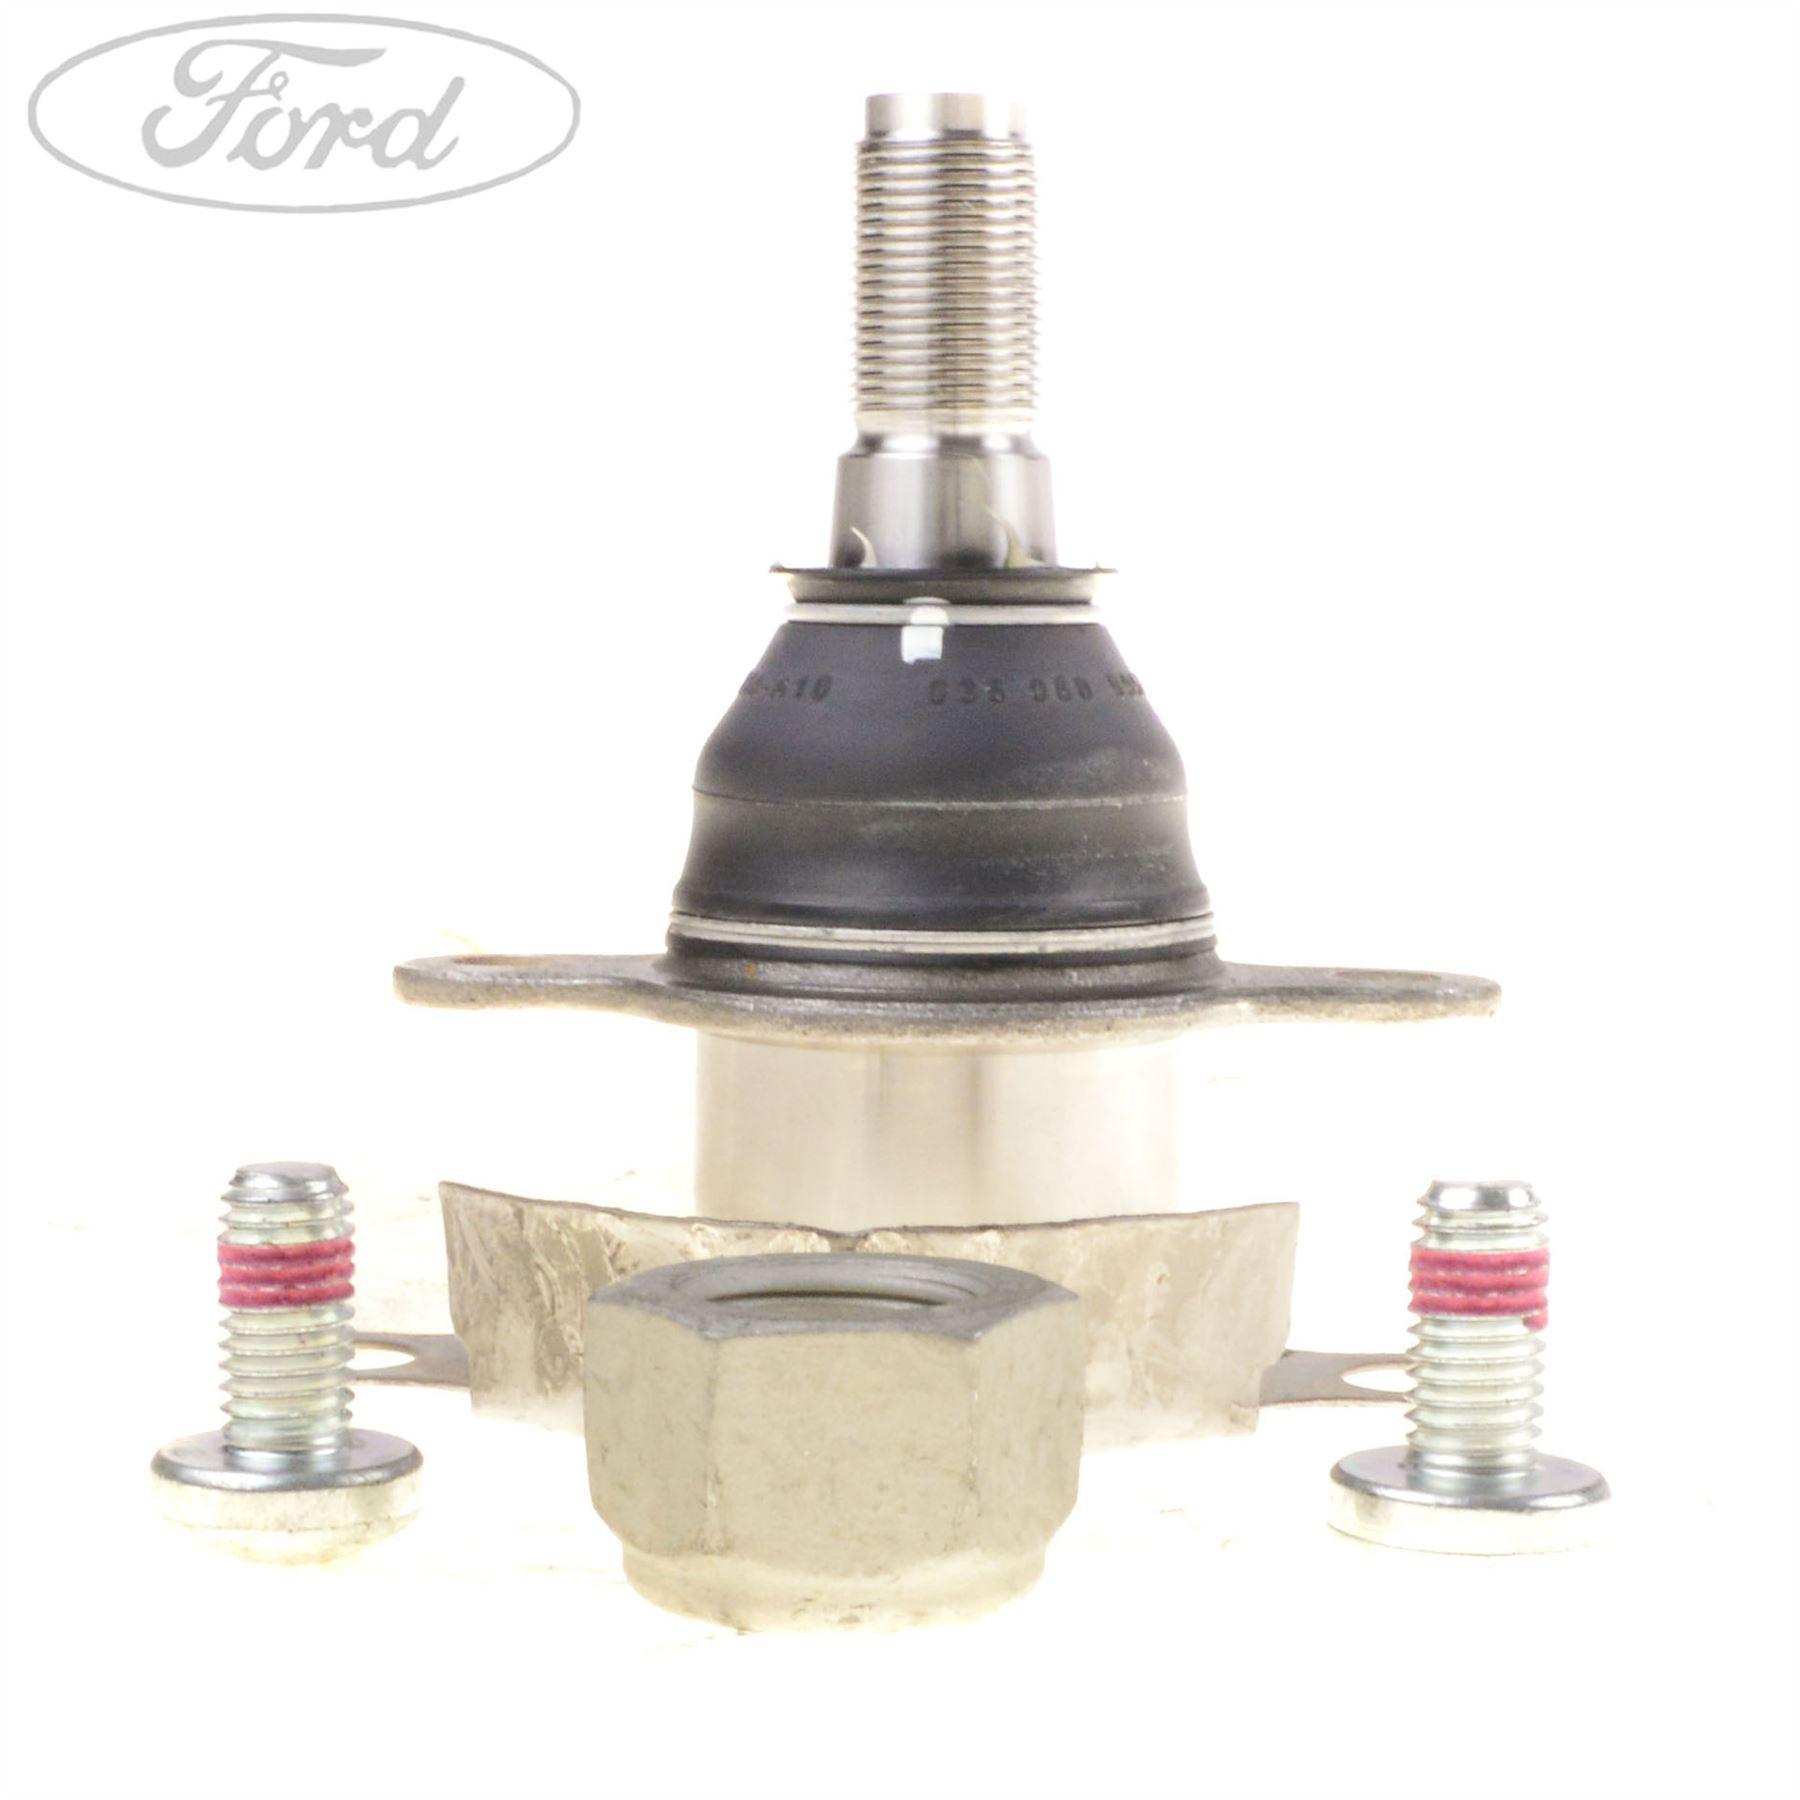 1x Cv Joint Kit Ford Transit 2.0 2.2 MK6 MK7 00-12